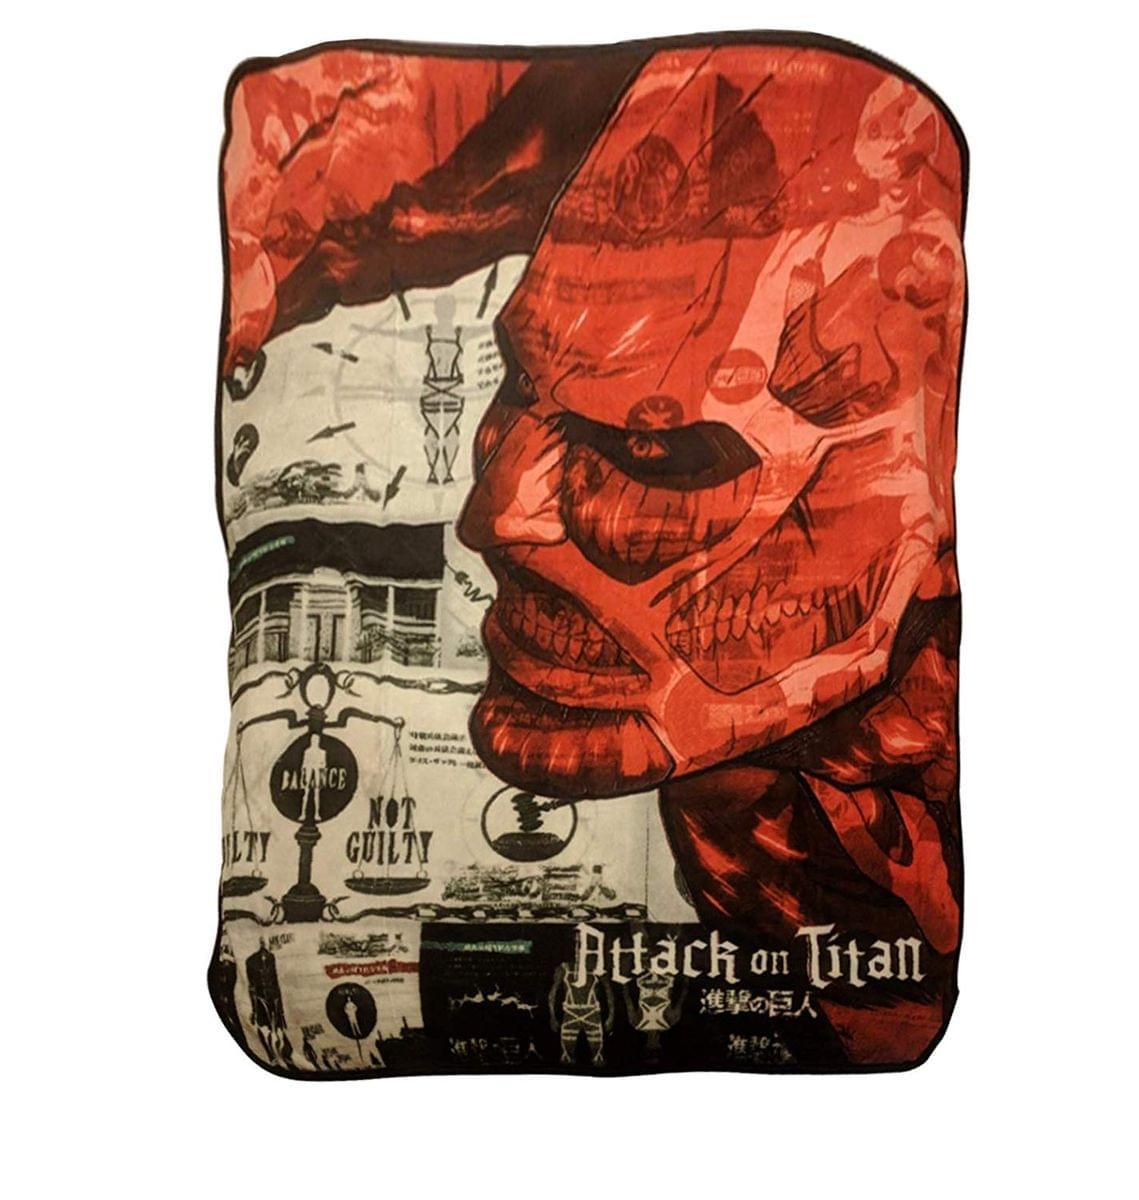 Attack on Titan Colossal Titan Lightweight Fleece Throw Blanket | 45 x 60 Inches